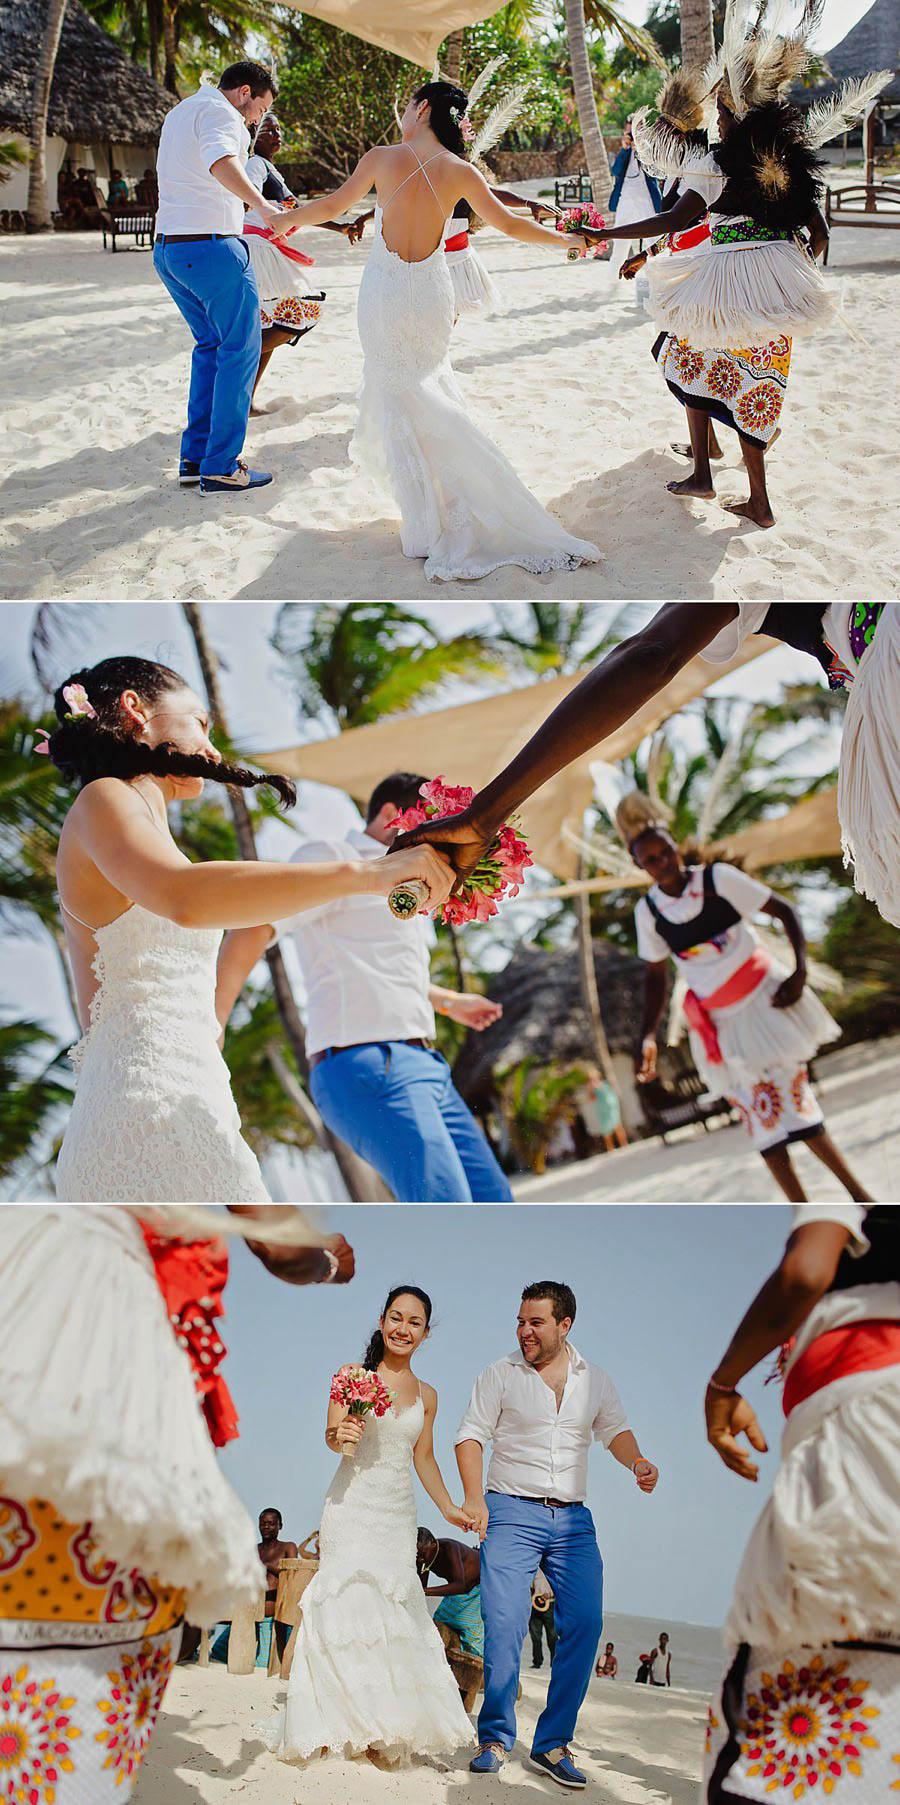 zanzibar_tanzania_kenya_malindi_beach_multicultural_wedding_photography_mamalovebabamarry_0016.jpg